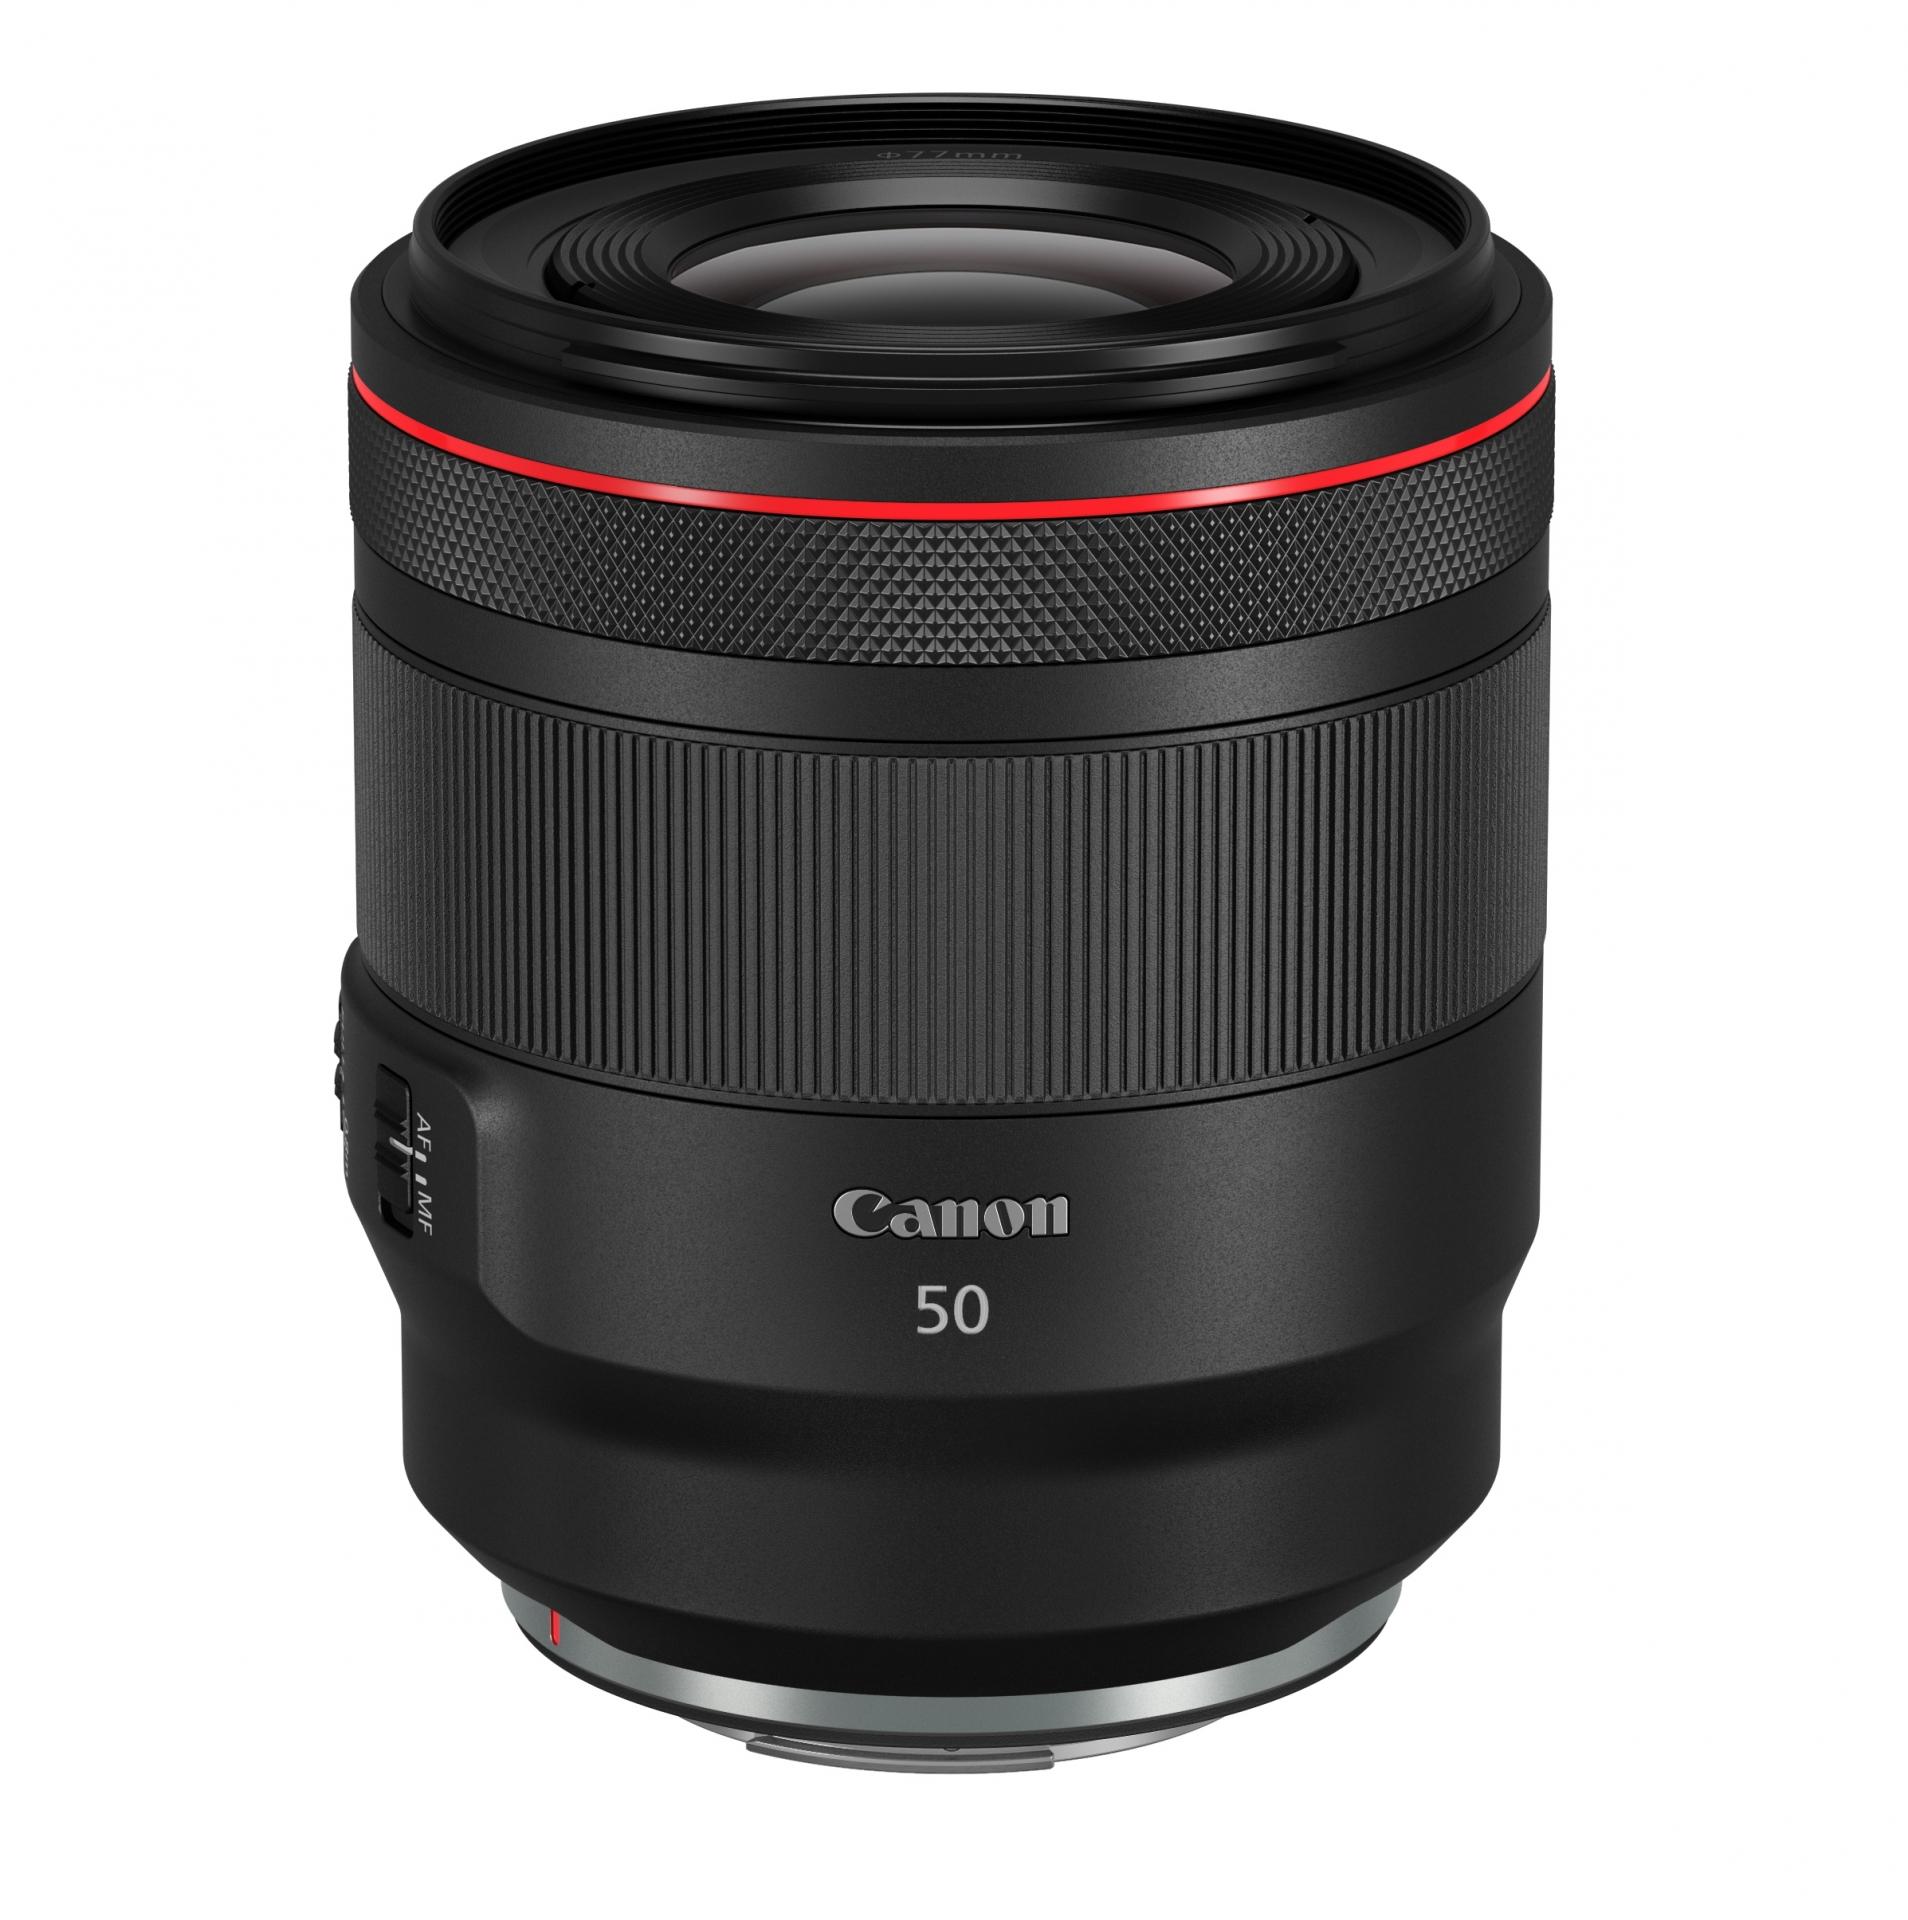 Canon Objektive, RF Objektive, EF Objektive, Adapter